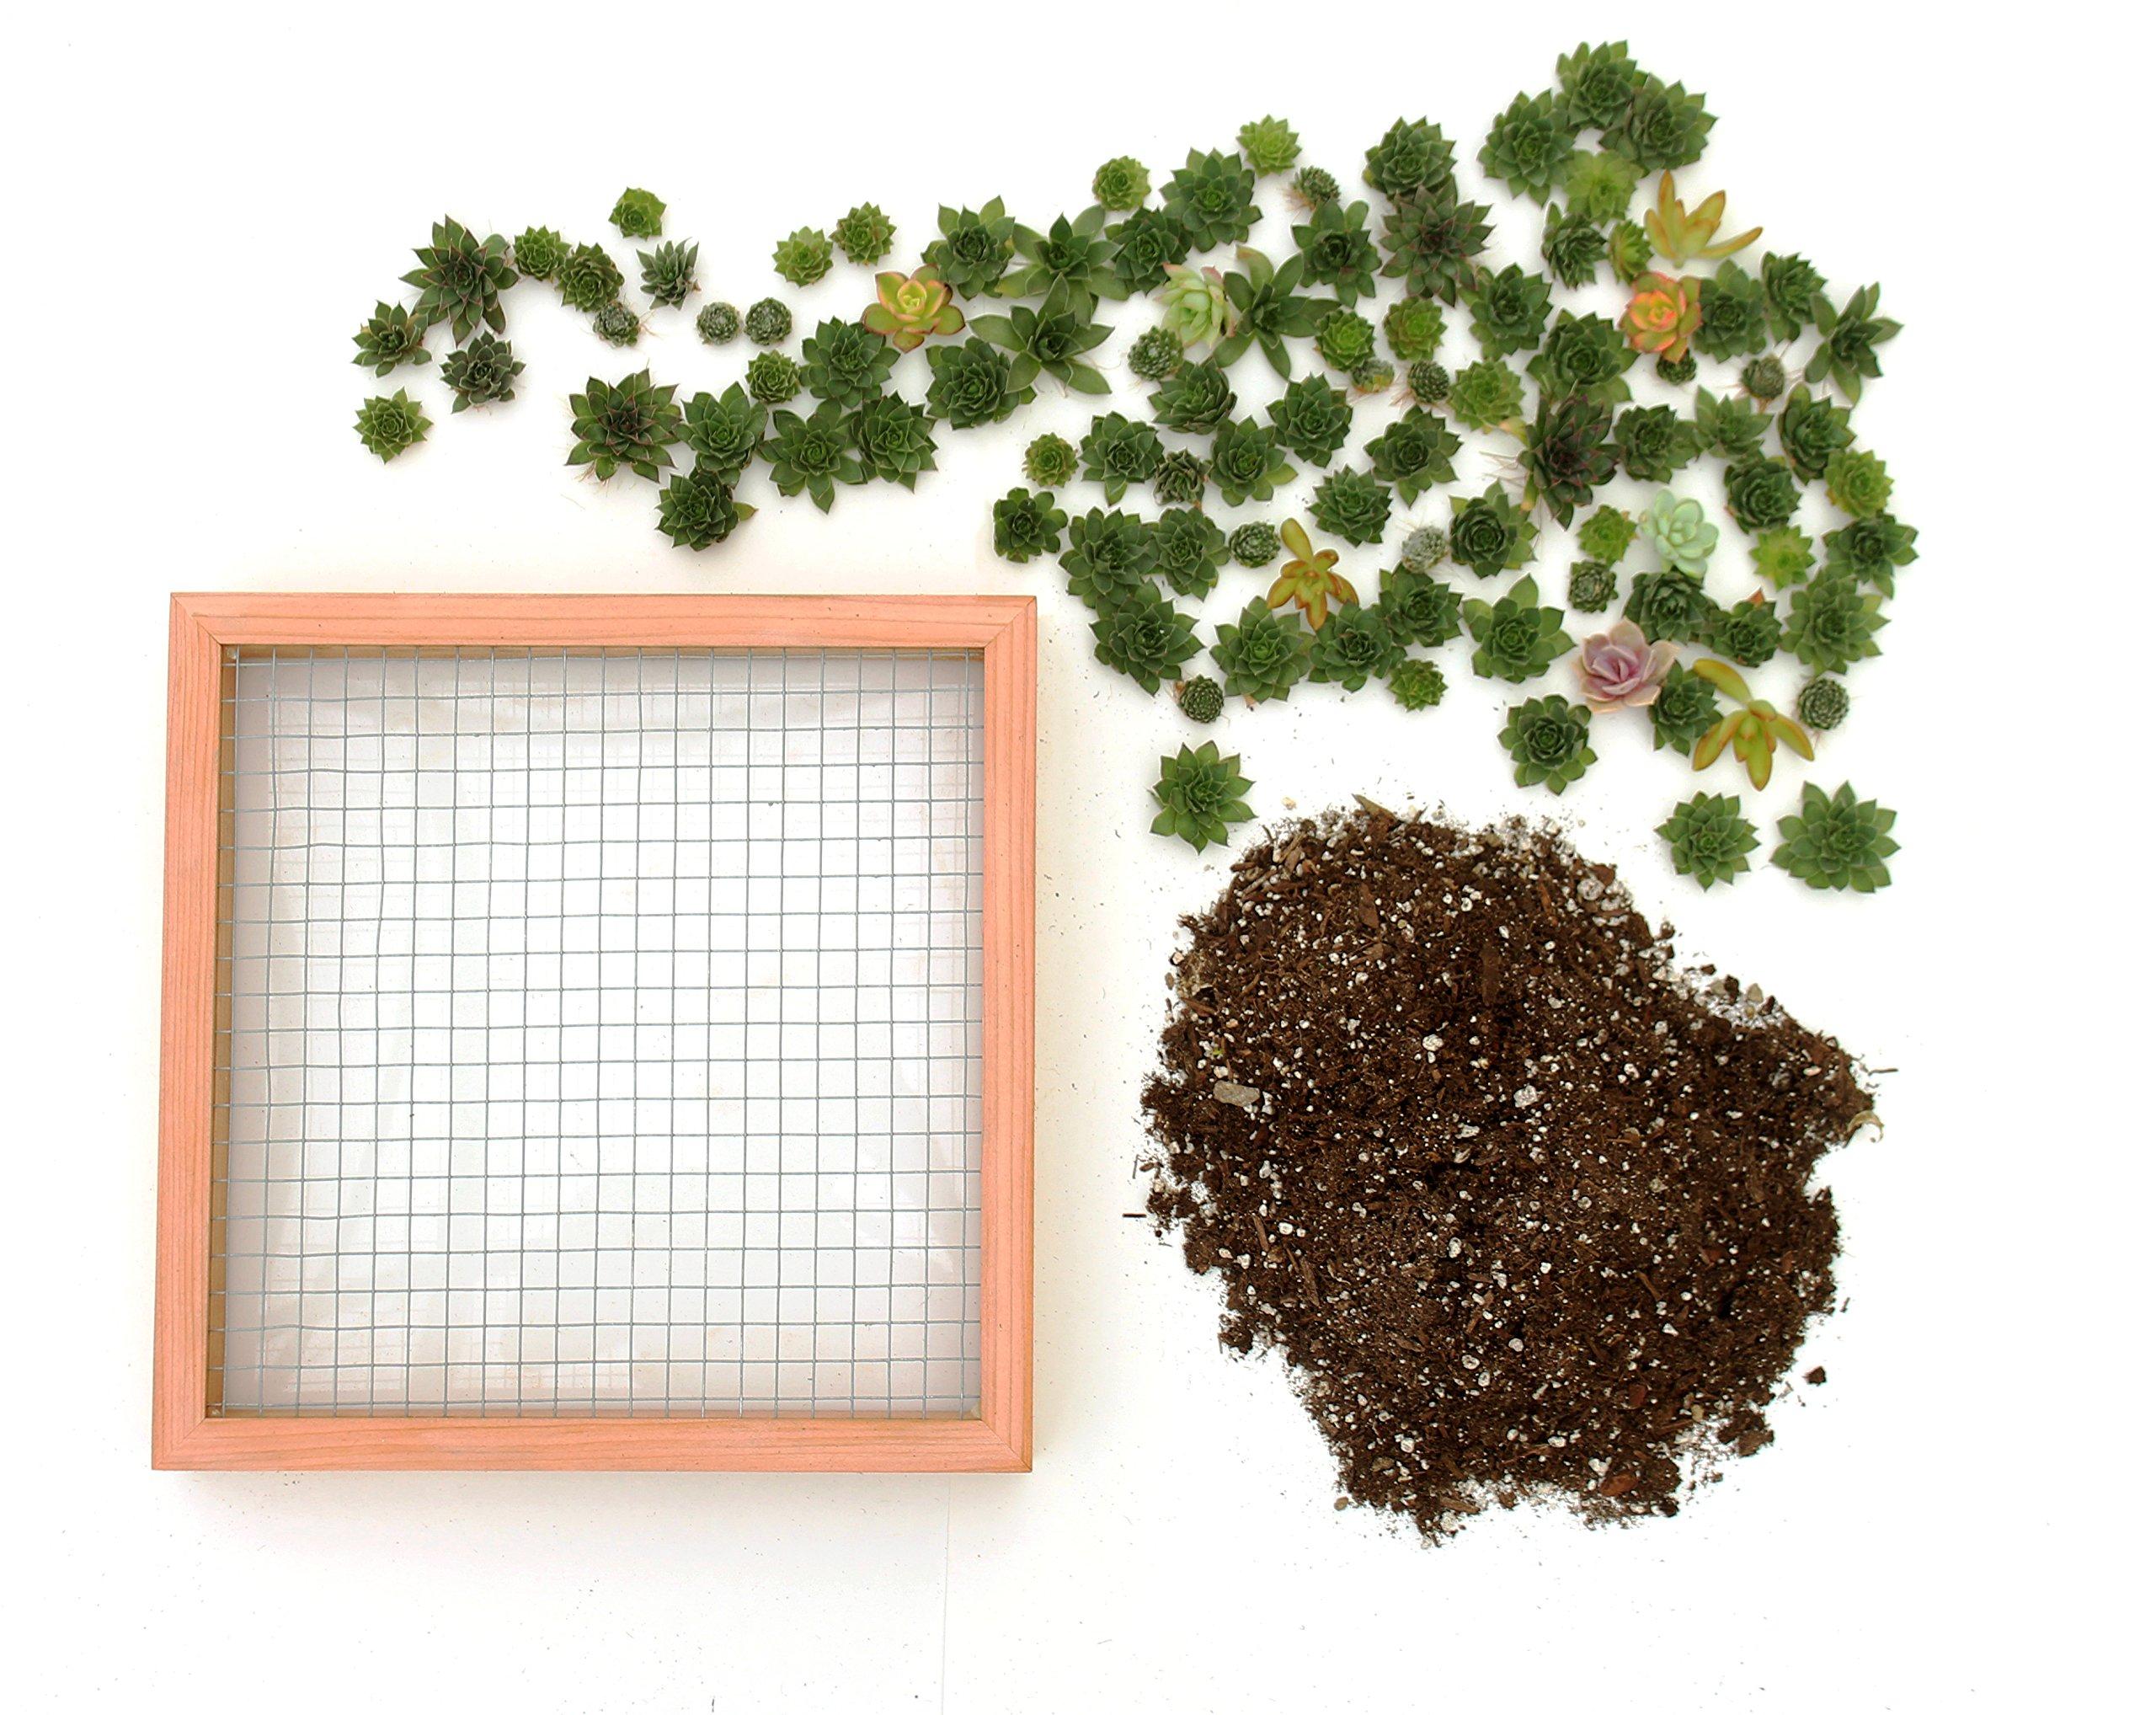 Succulent Gardens Large Living Picture Planter DIY Kit, 12''sq. Frame, Multicolor